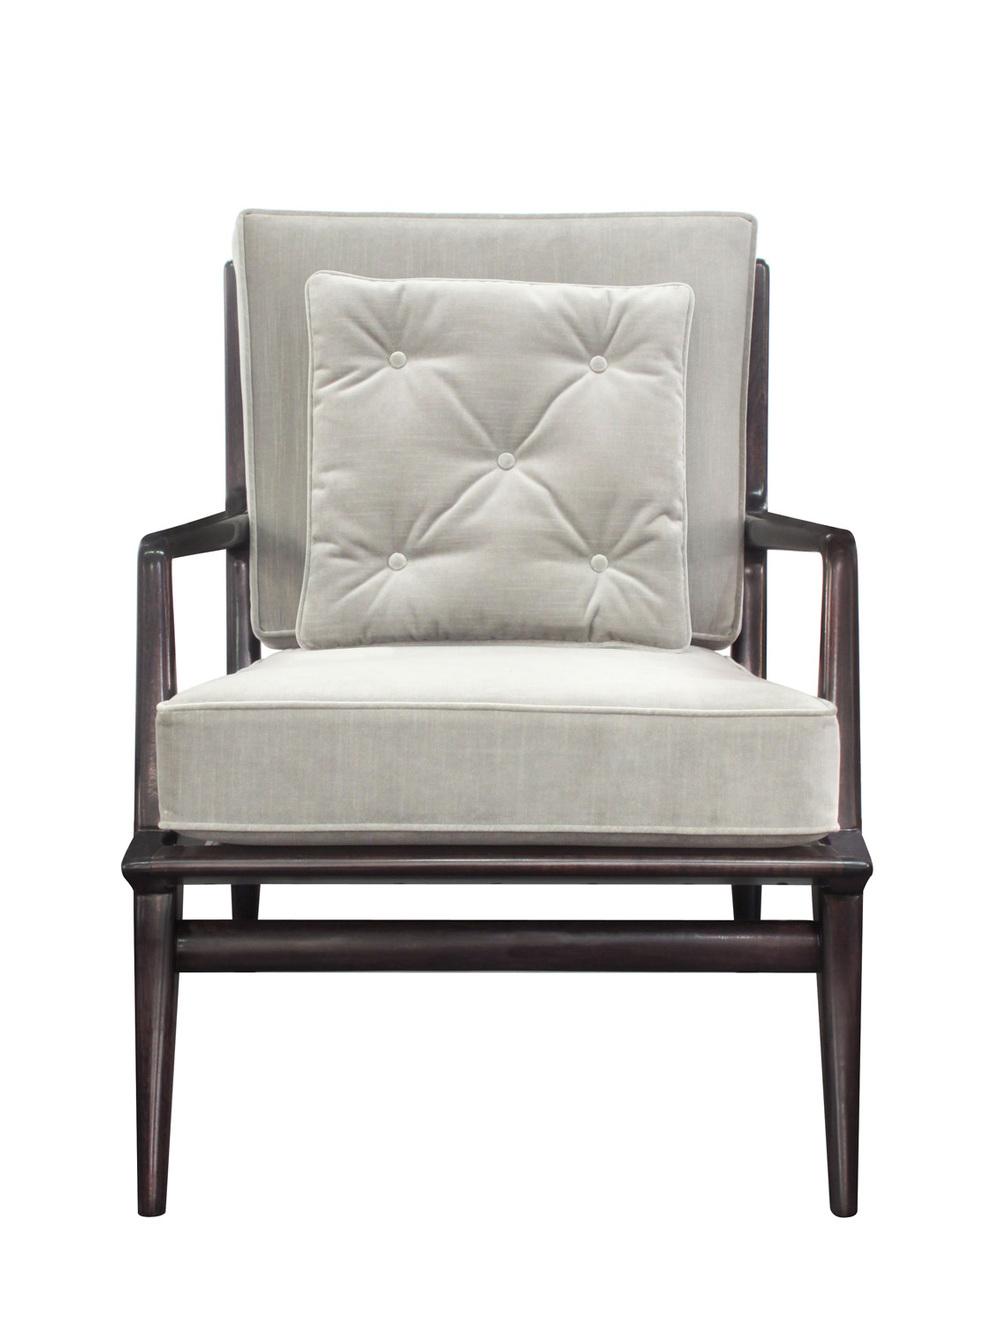 Di Carli 85 drk walnut chair&ottoman53 detail1 hires.jpg